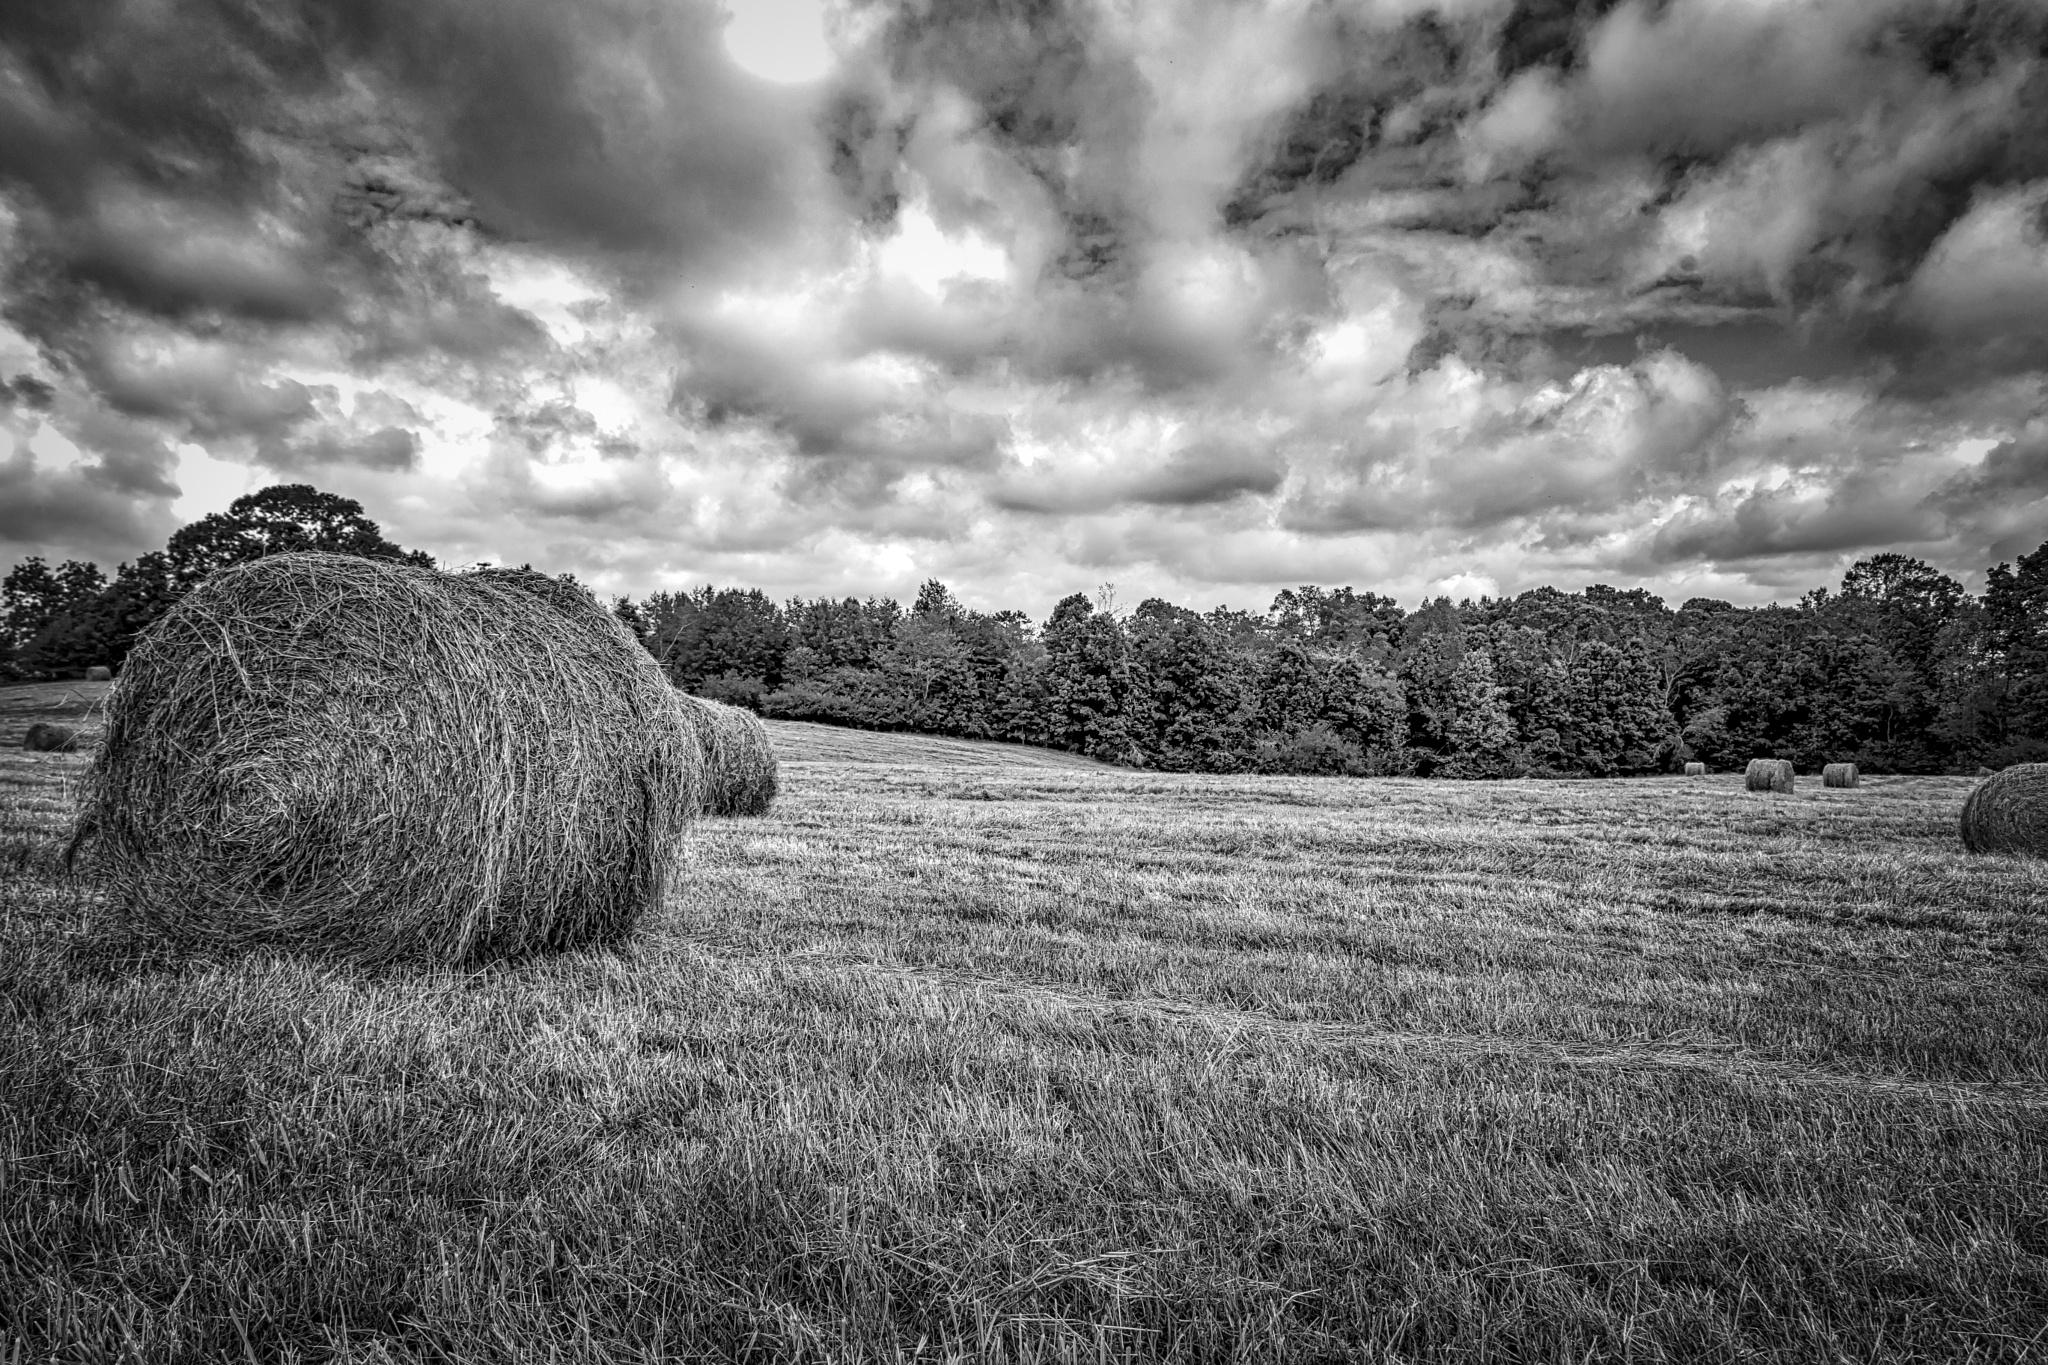 Hay Bales - North Georgia Mountains by Mark Streit